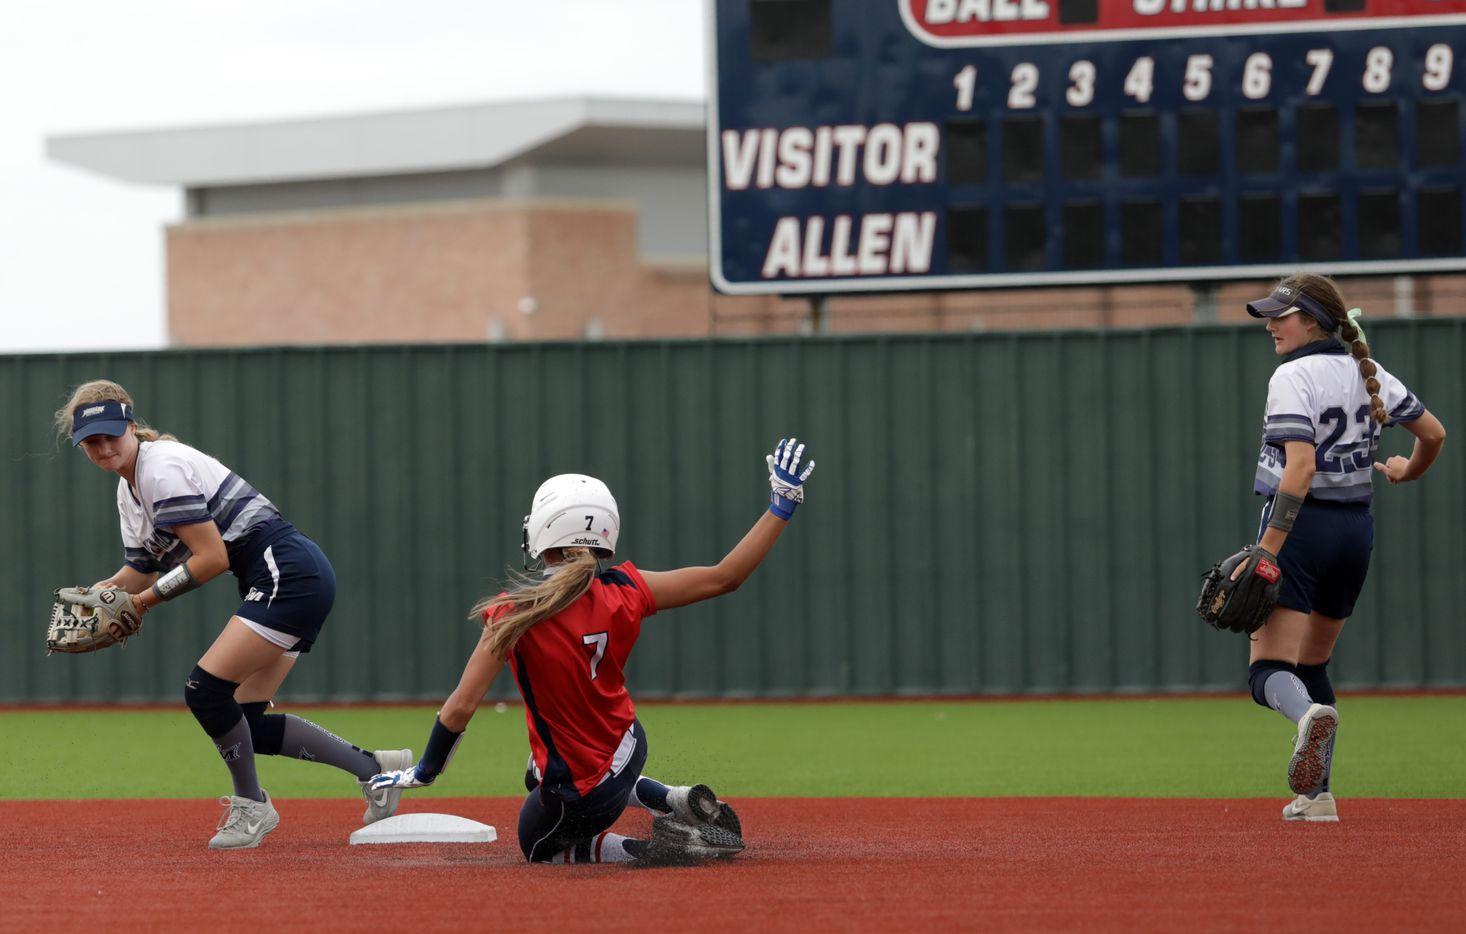 Flower Mound High School player #6, McKenna Andrews, stops Allen High School player #7, Chloe Schimmel, from taking second base during a softball playoff game at Allen High School in Allen, TX, on May 15, 2021. (Jason Janik/Special Contributor)